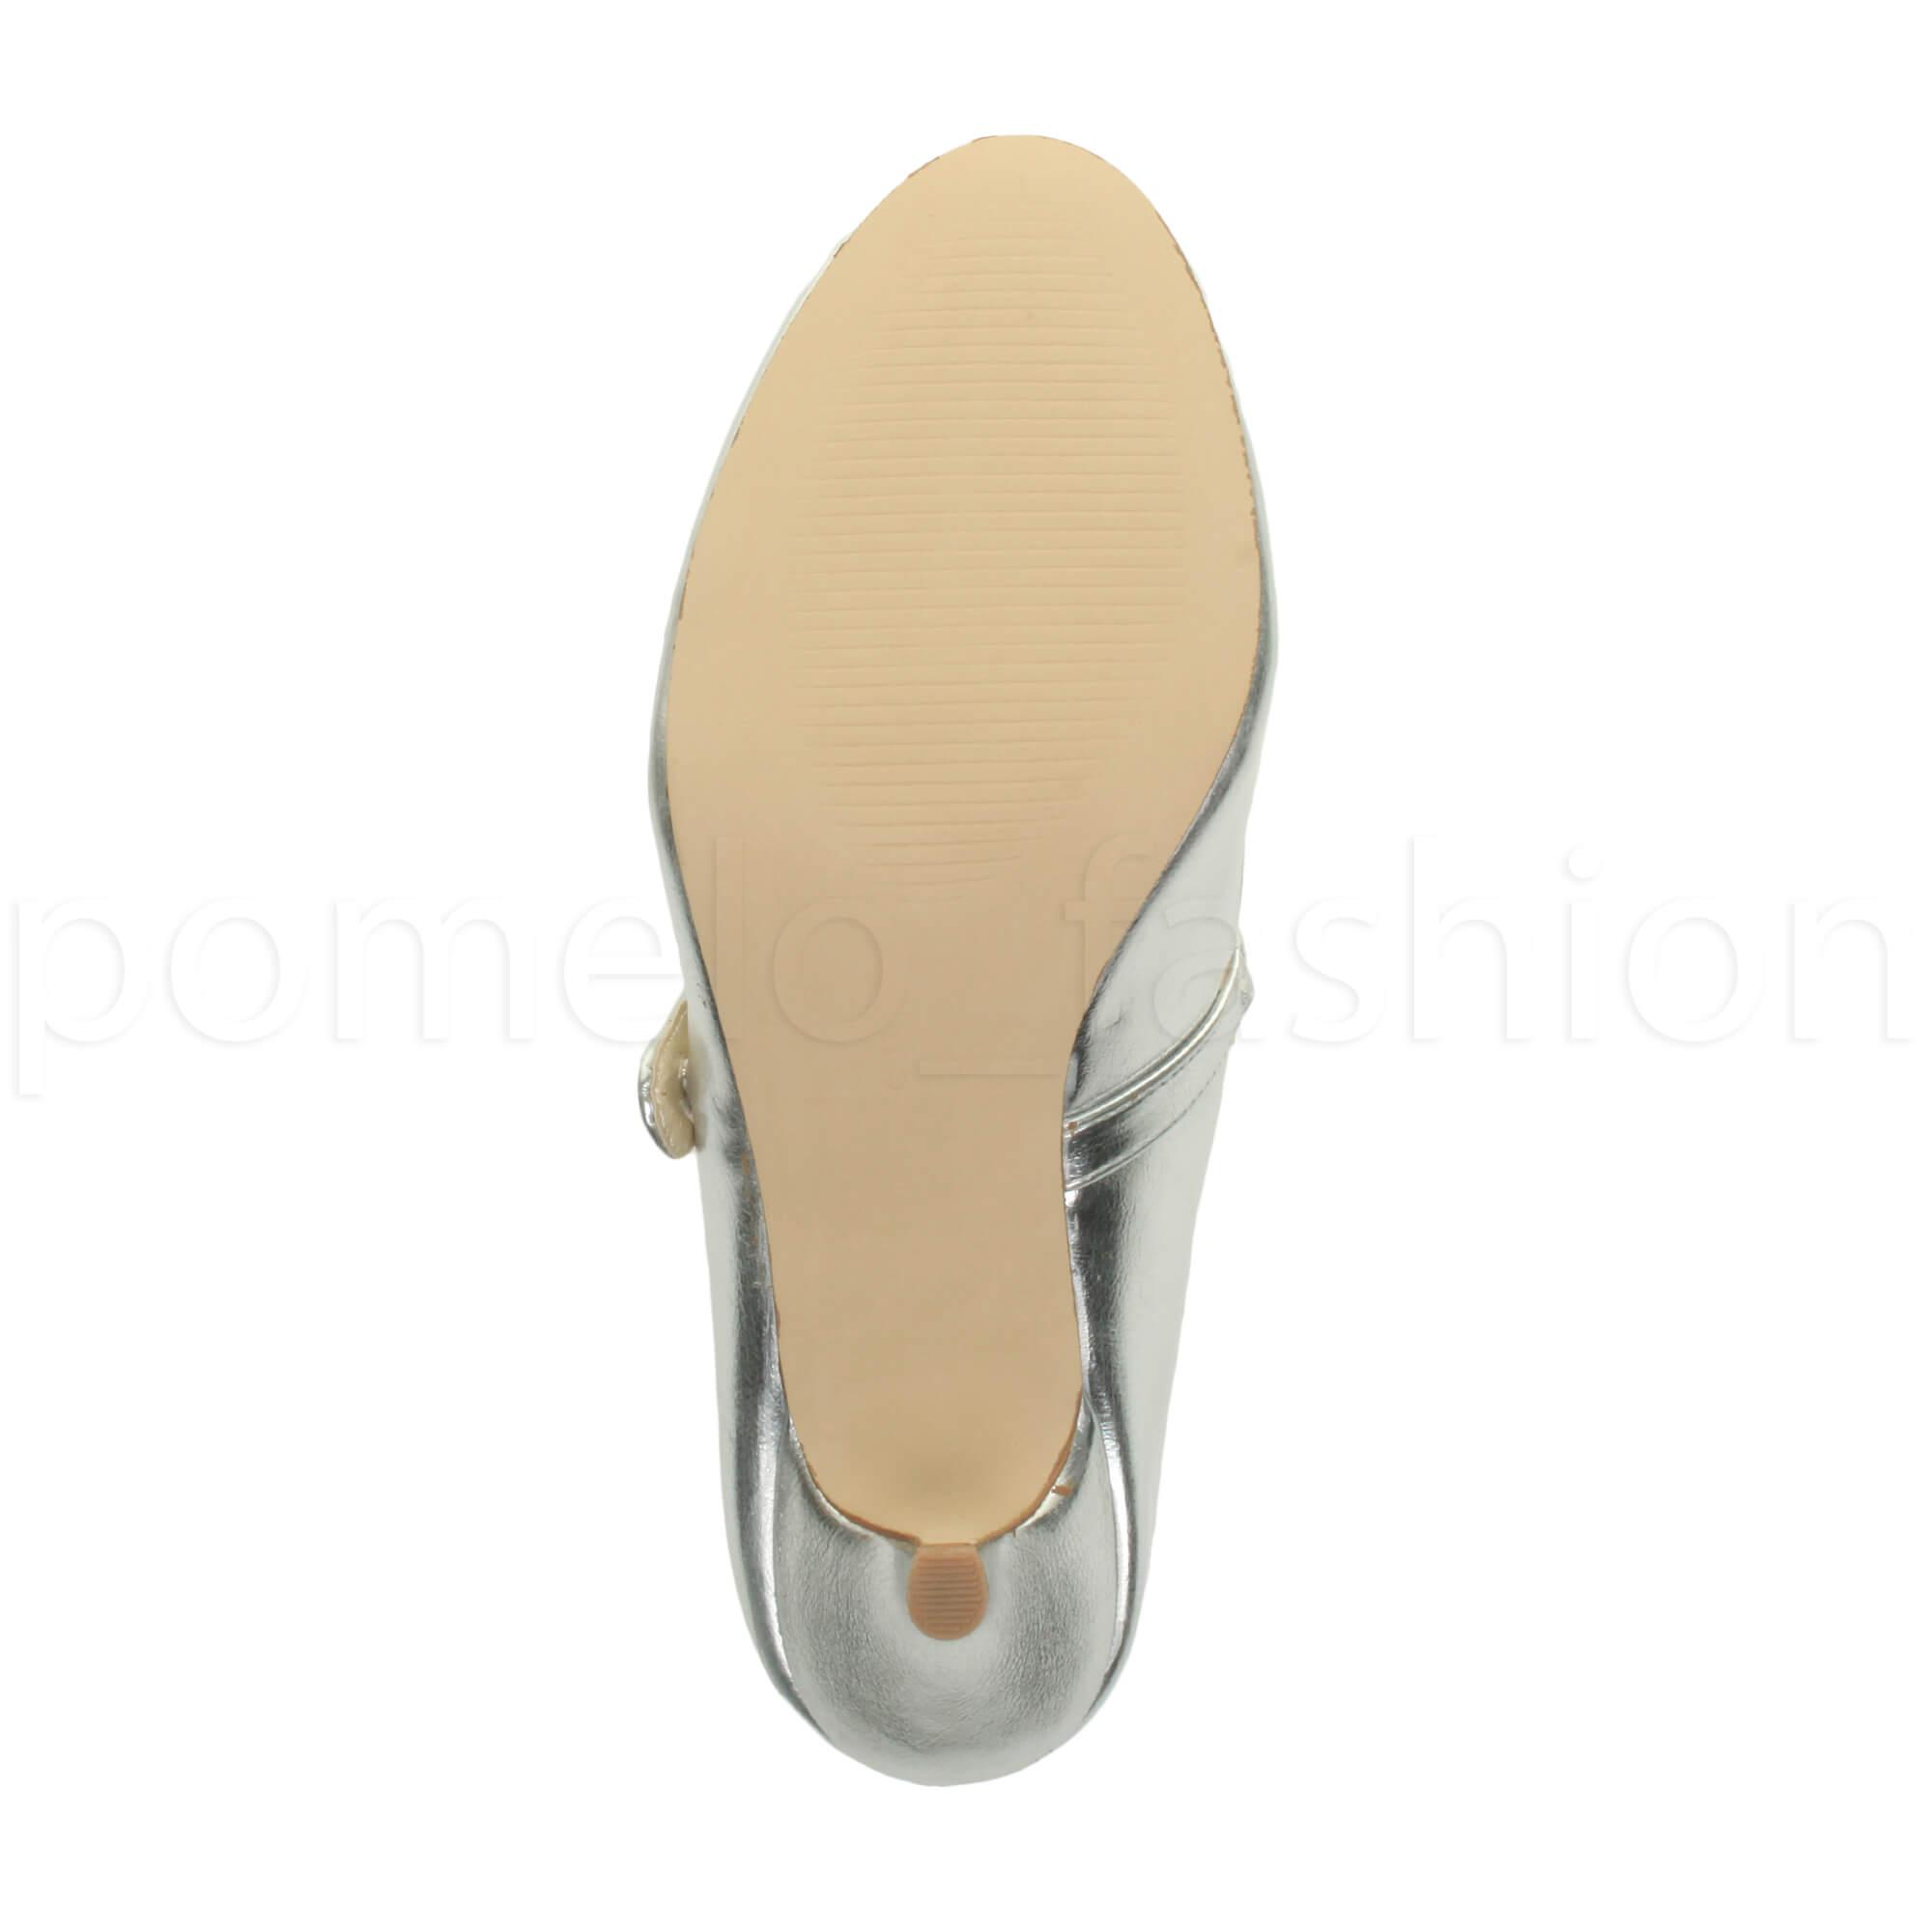 miniatura 155 - Donna basso tacco medio Mary Jane Damigella Matrimonio Pompe Scarpe Da Sera Taglia